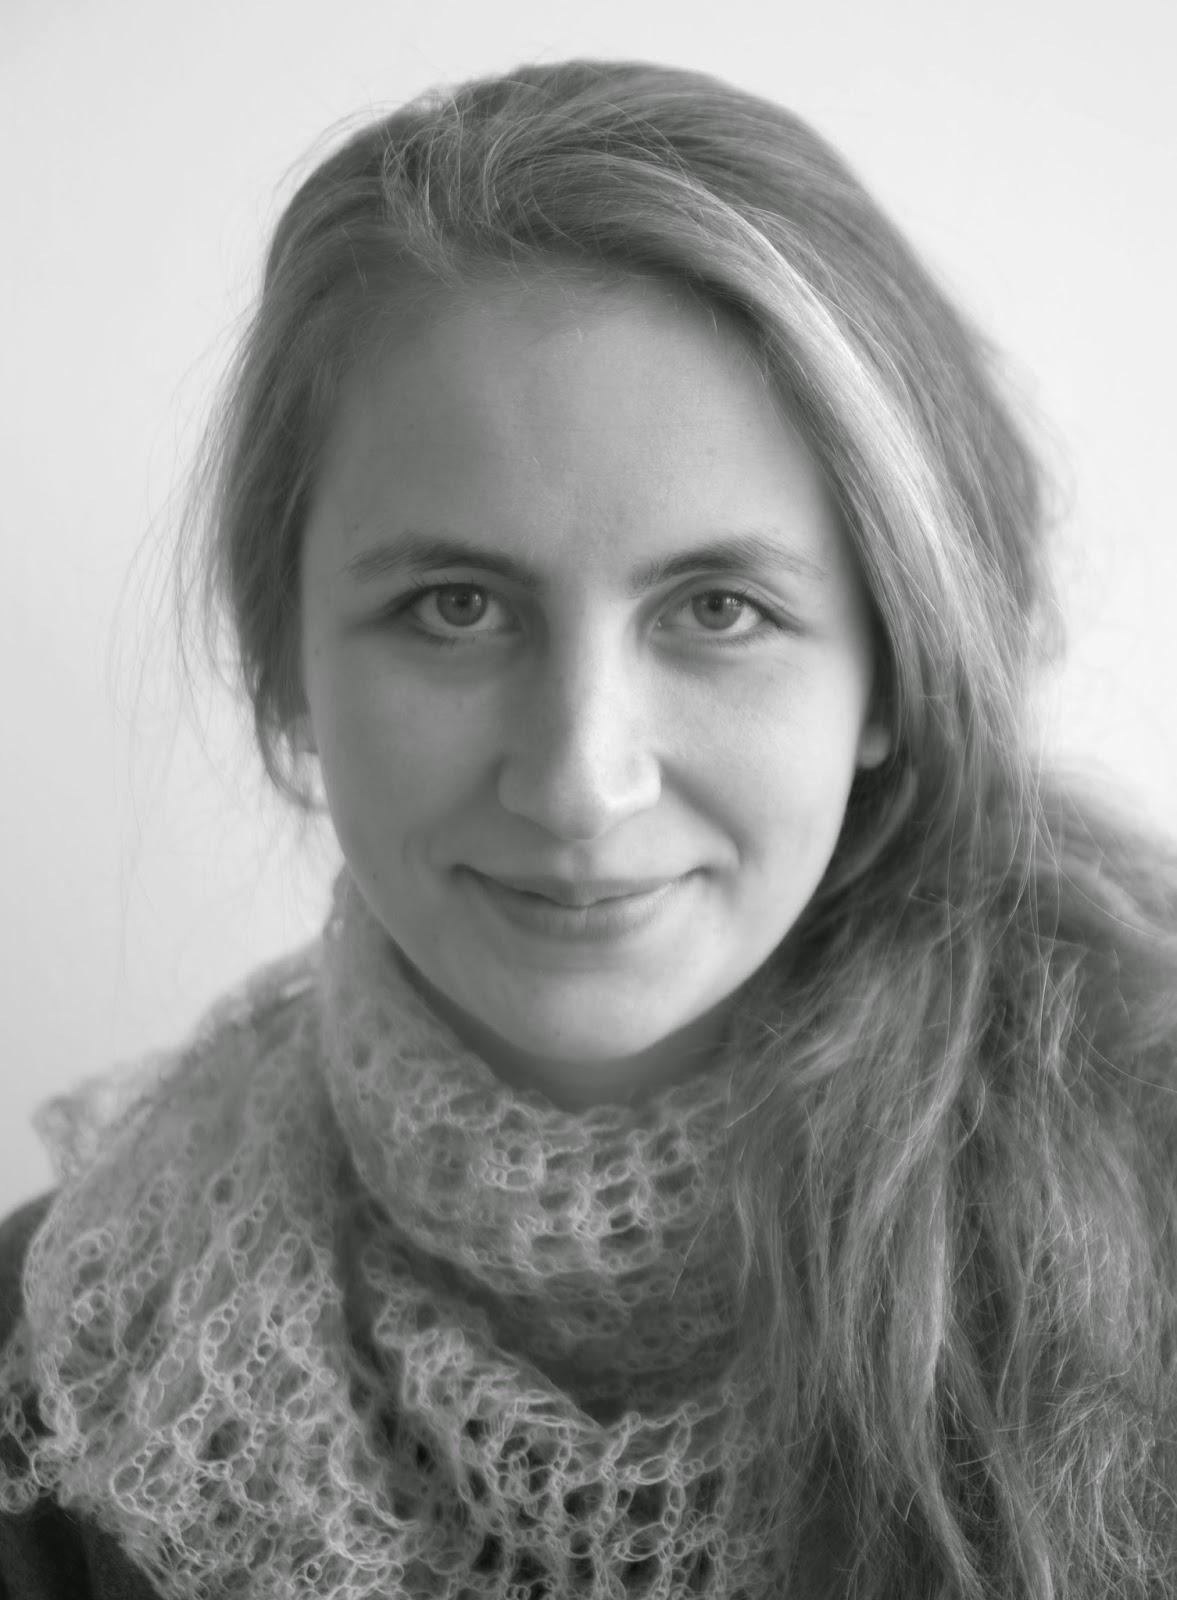 Foto von Sonja Simone Albert, Dozentin des Malereiworkshops